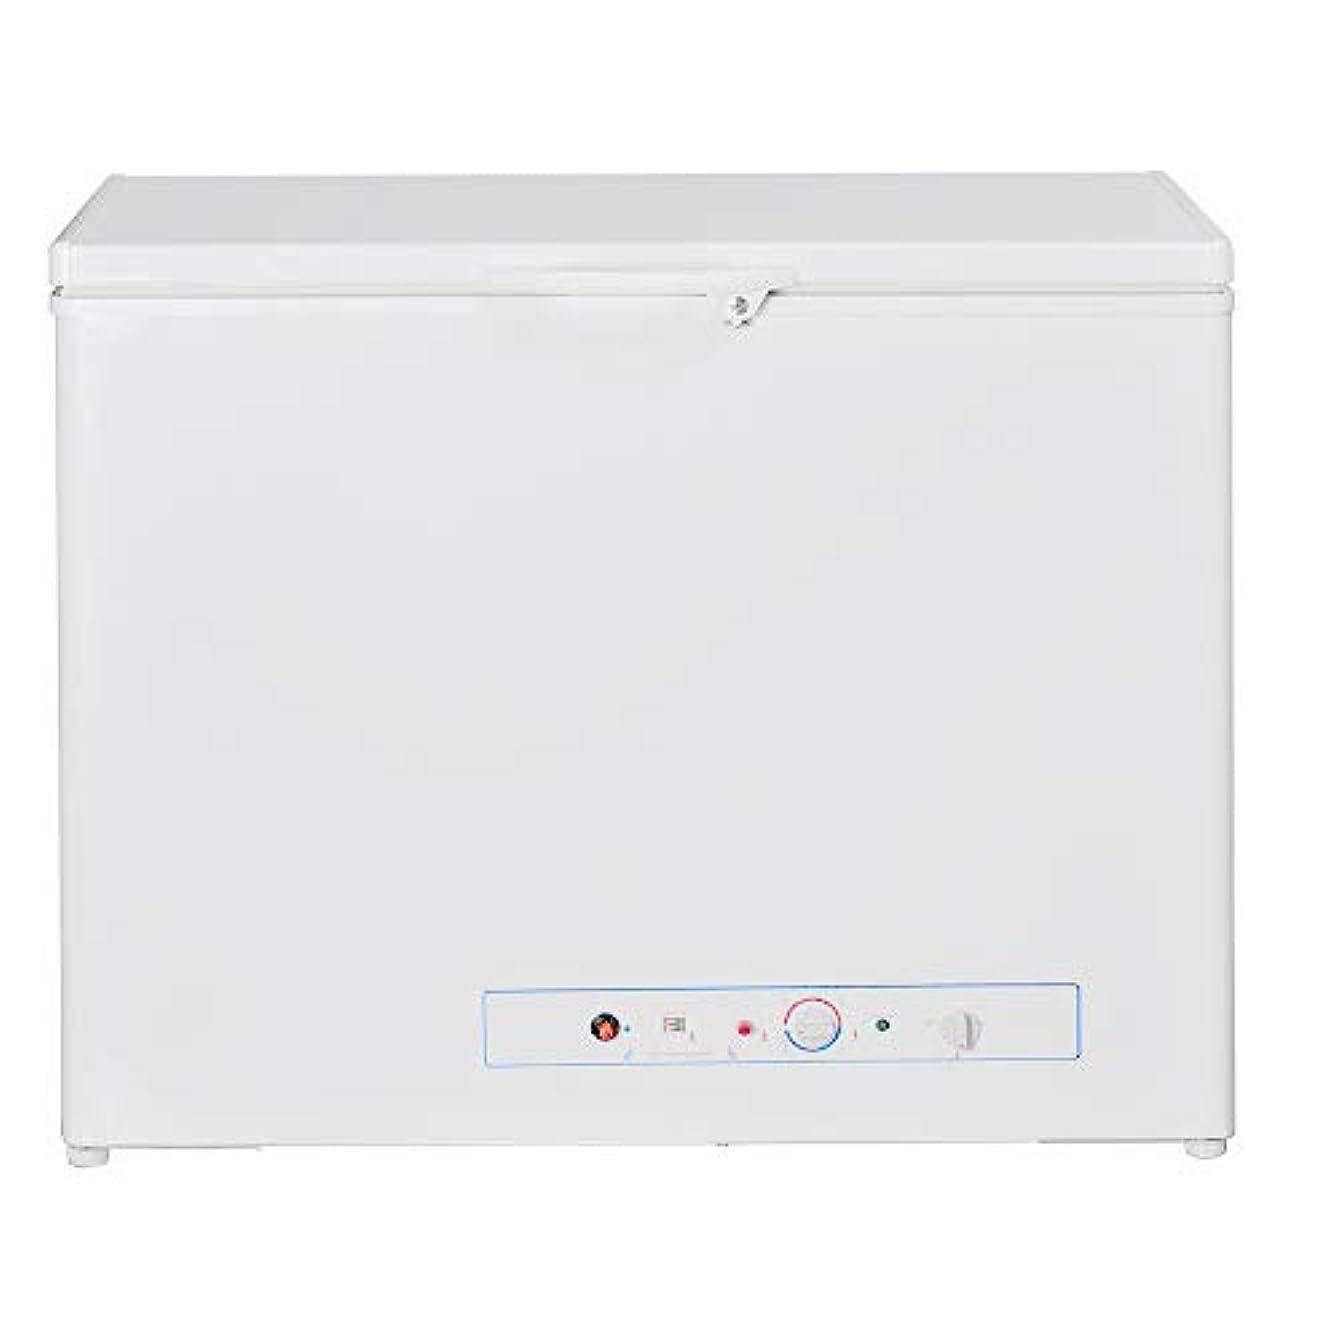 SMETA Chest Freezer 110v/Gas Propane Absorption Top Open freezer for Camper Home RV,5.7 Cu ft,White